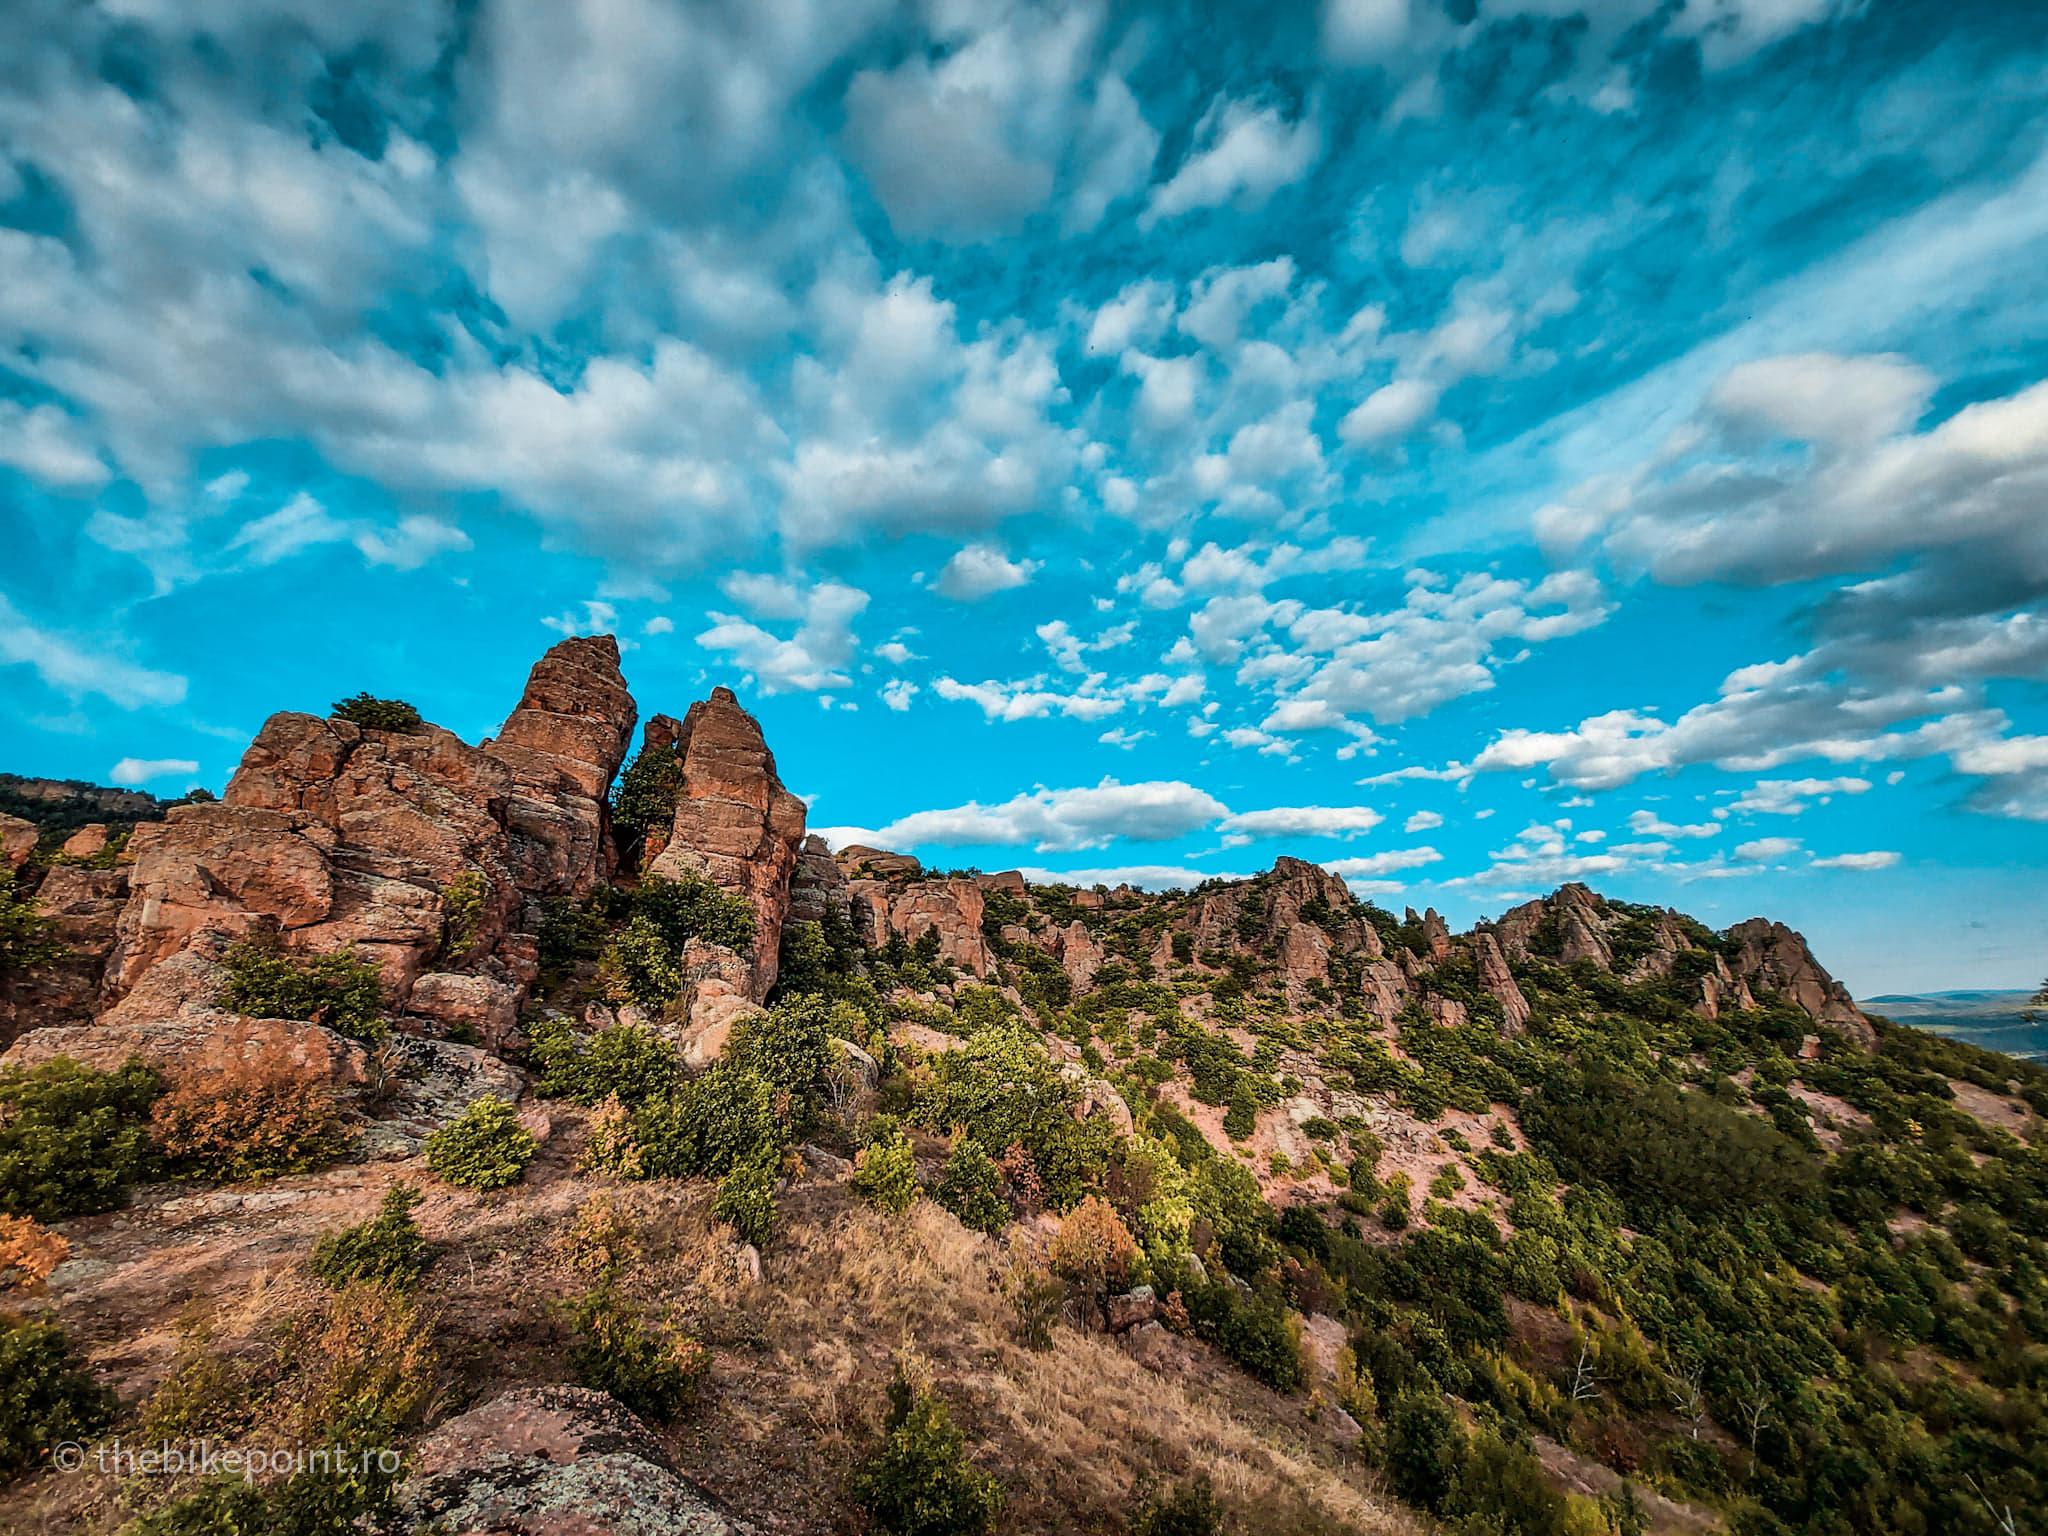 Borovitsa Pine Stone